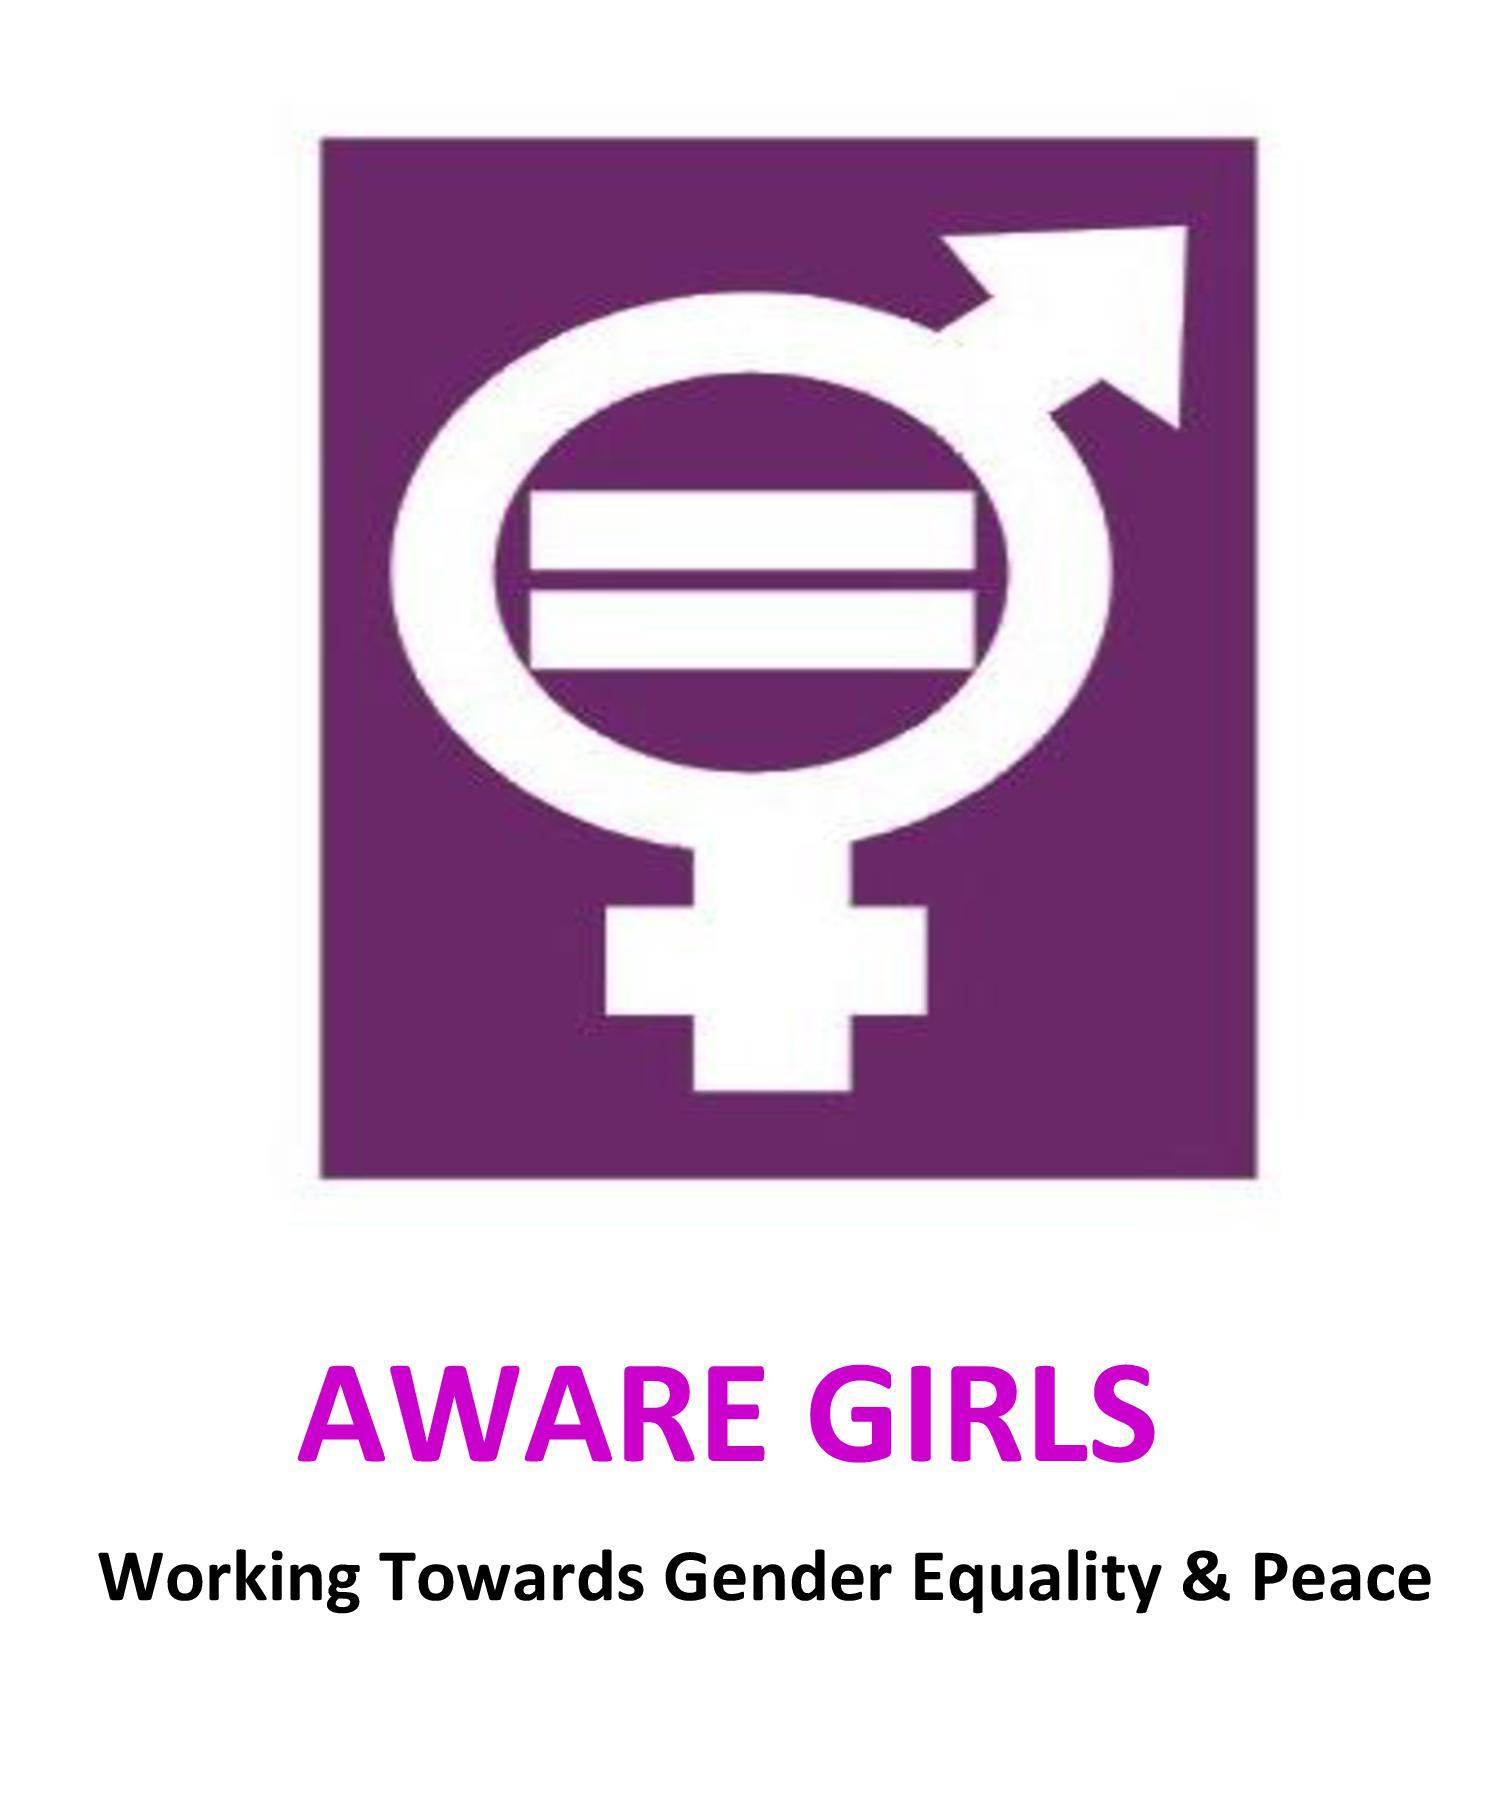 aware girls logo